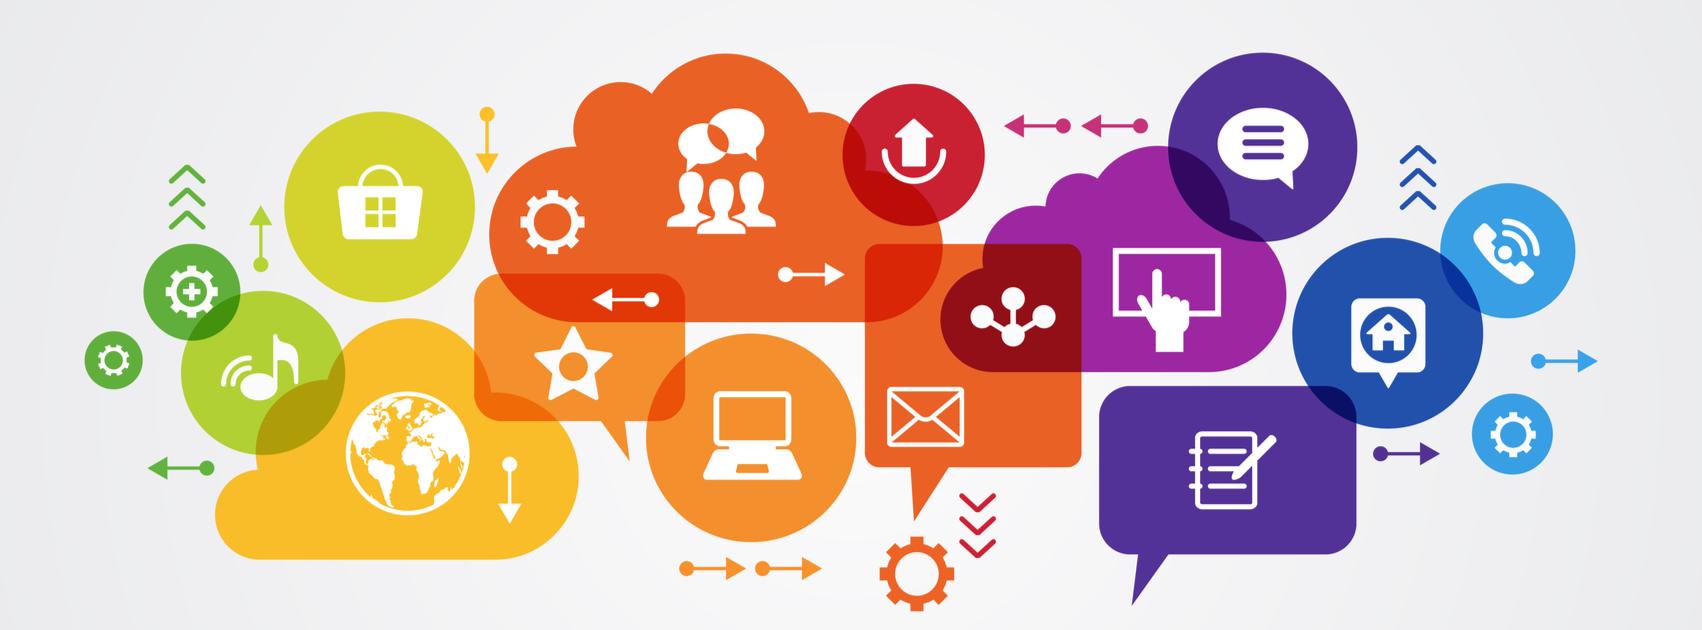 Microsoft Office 365 E1 jetzt 6 Monate gratis + Umstellung in Raten zahlbar!